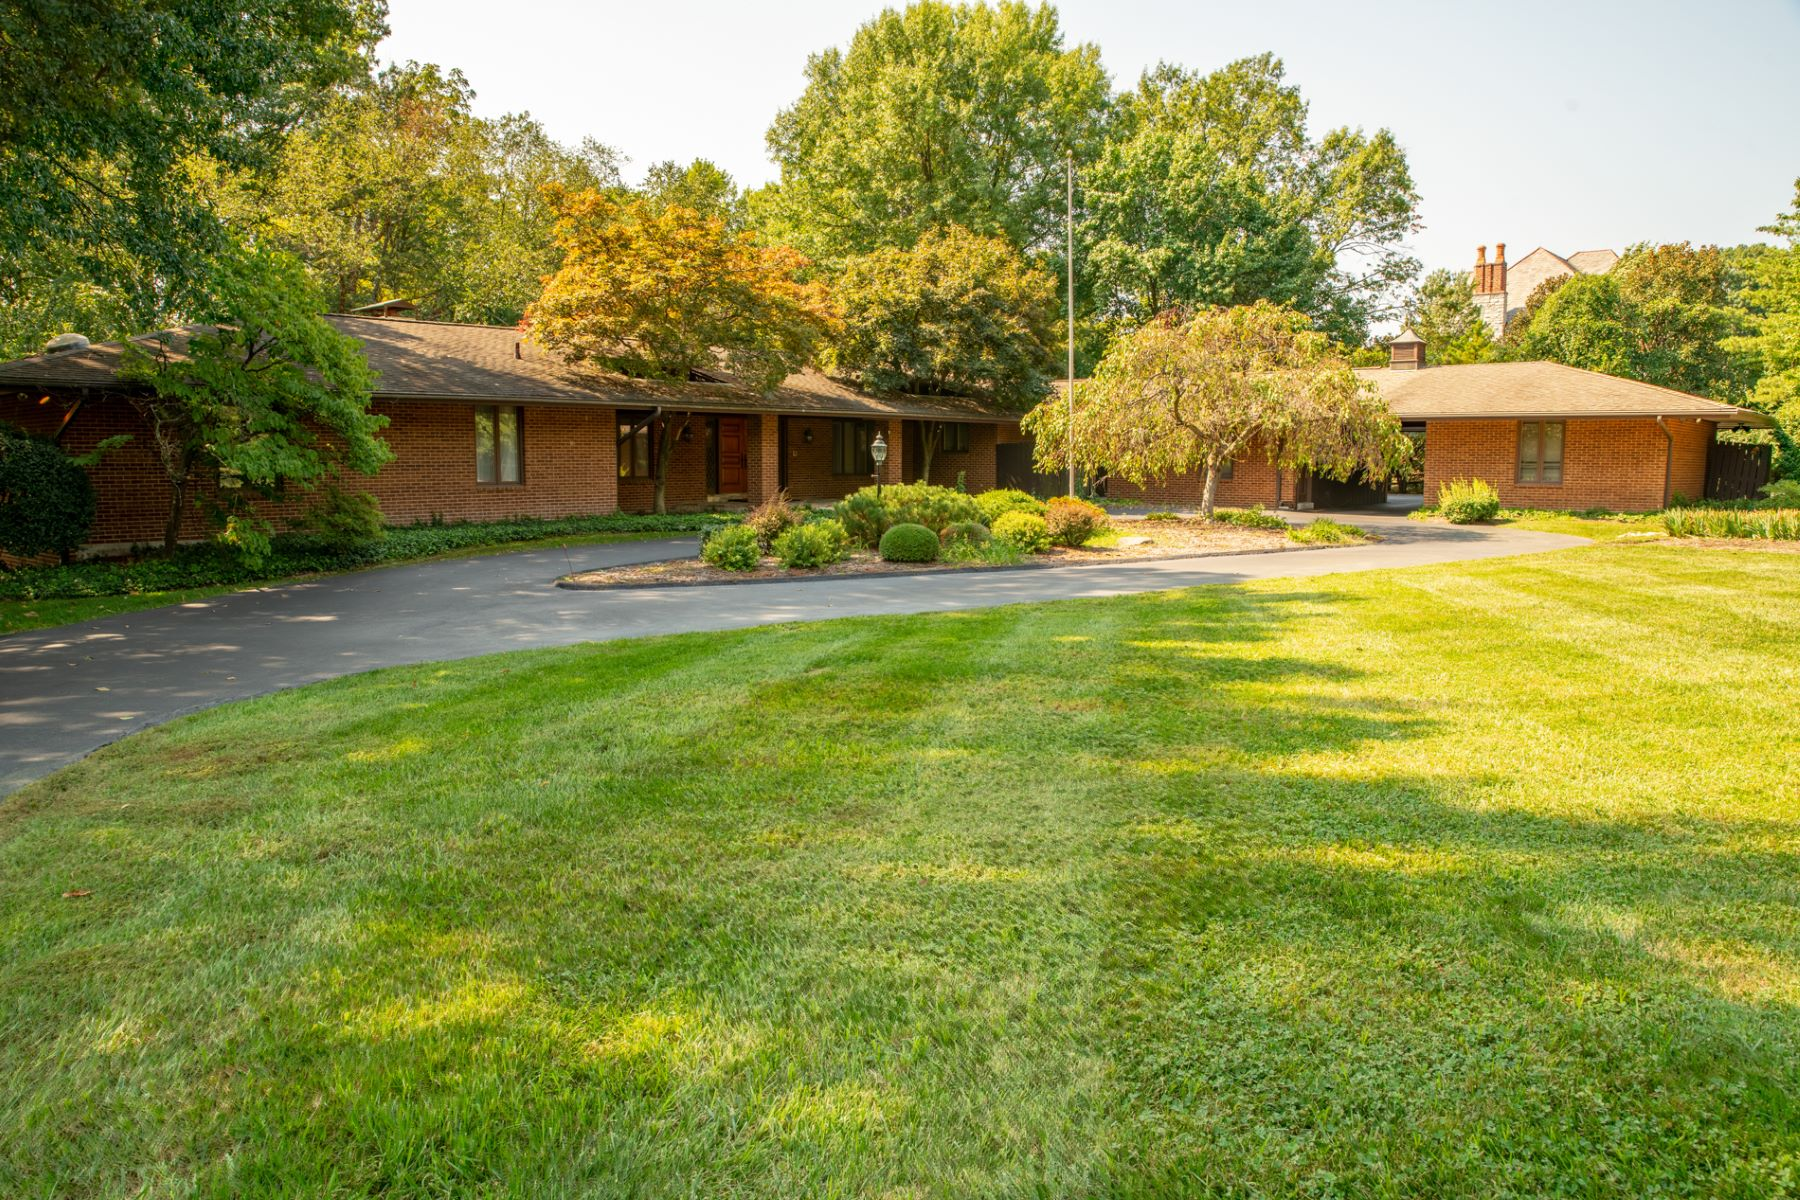 Additional photo for property listing at Winding Ridge Rd 10166 Winding Ridge Road Ladue, Missouri 63124 United States